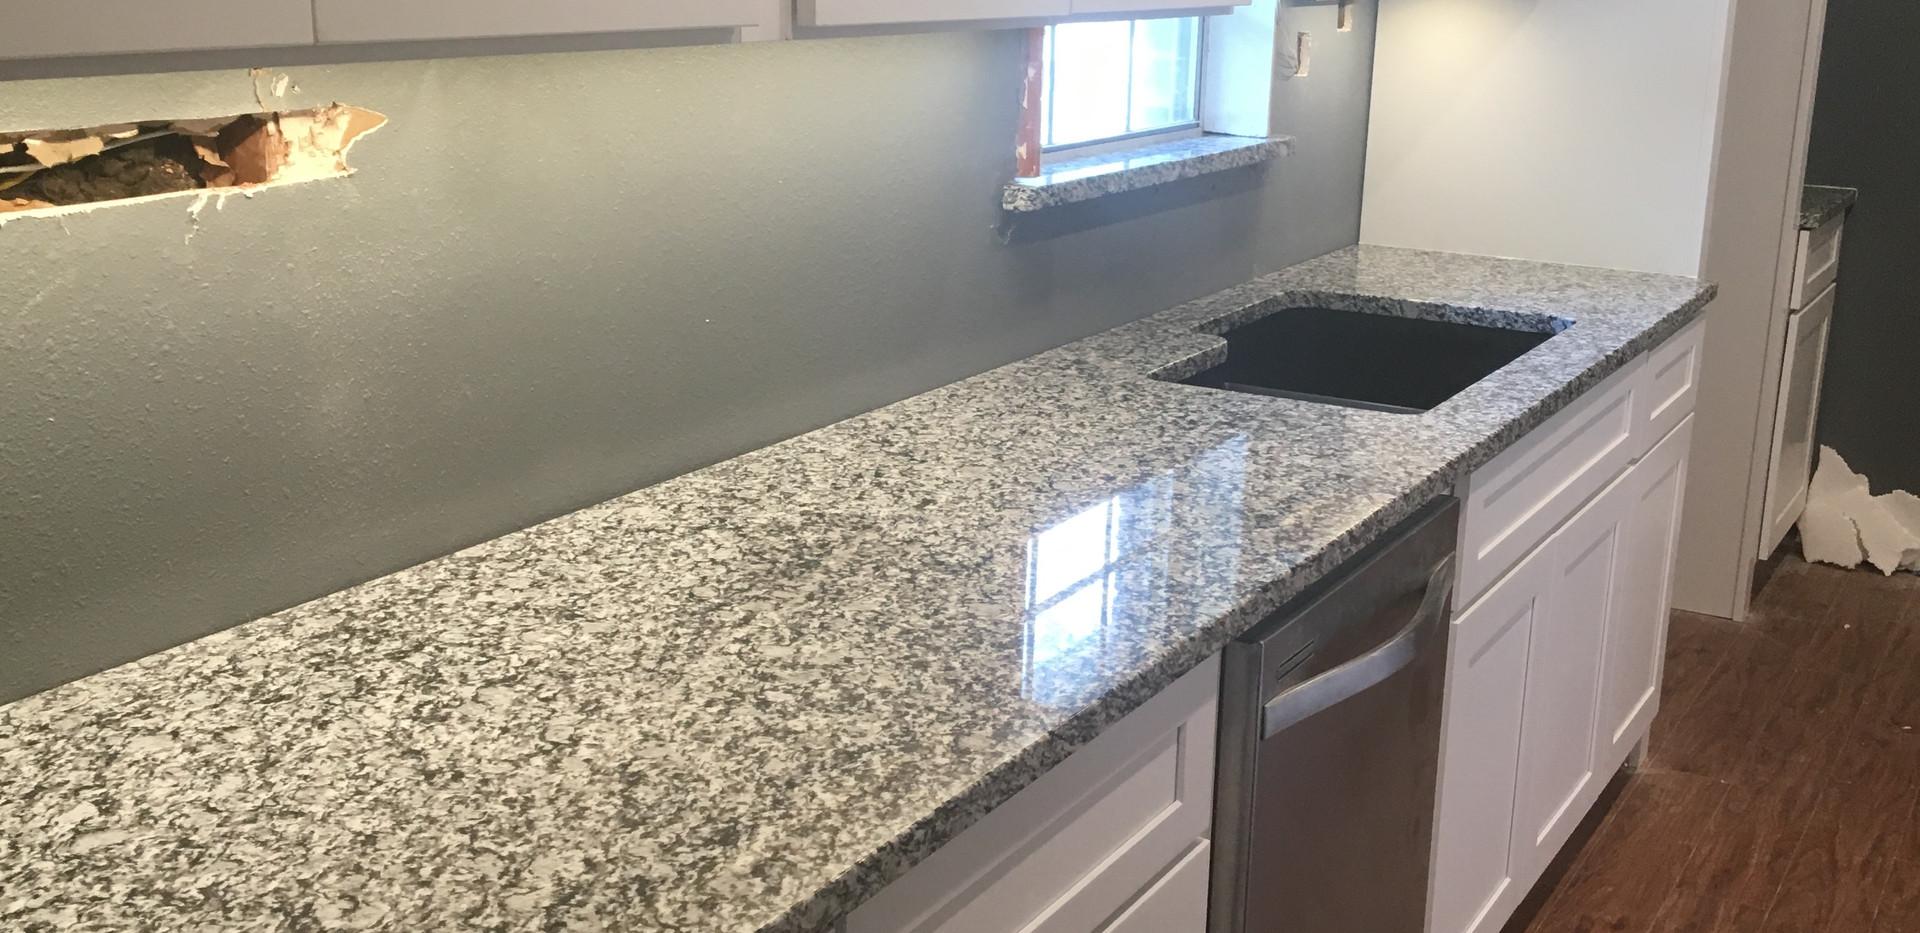 waterwave_granite_countertop_kitchen.JPG